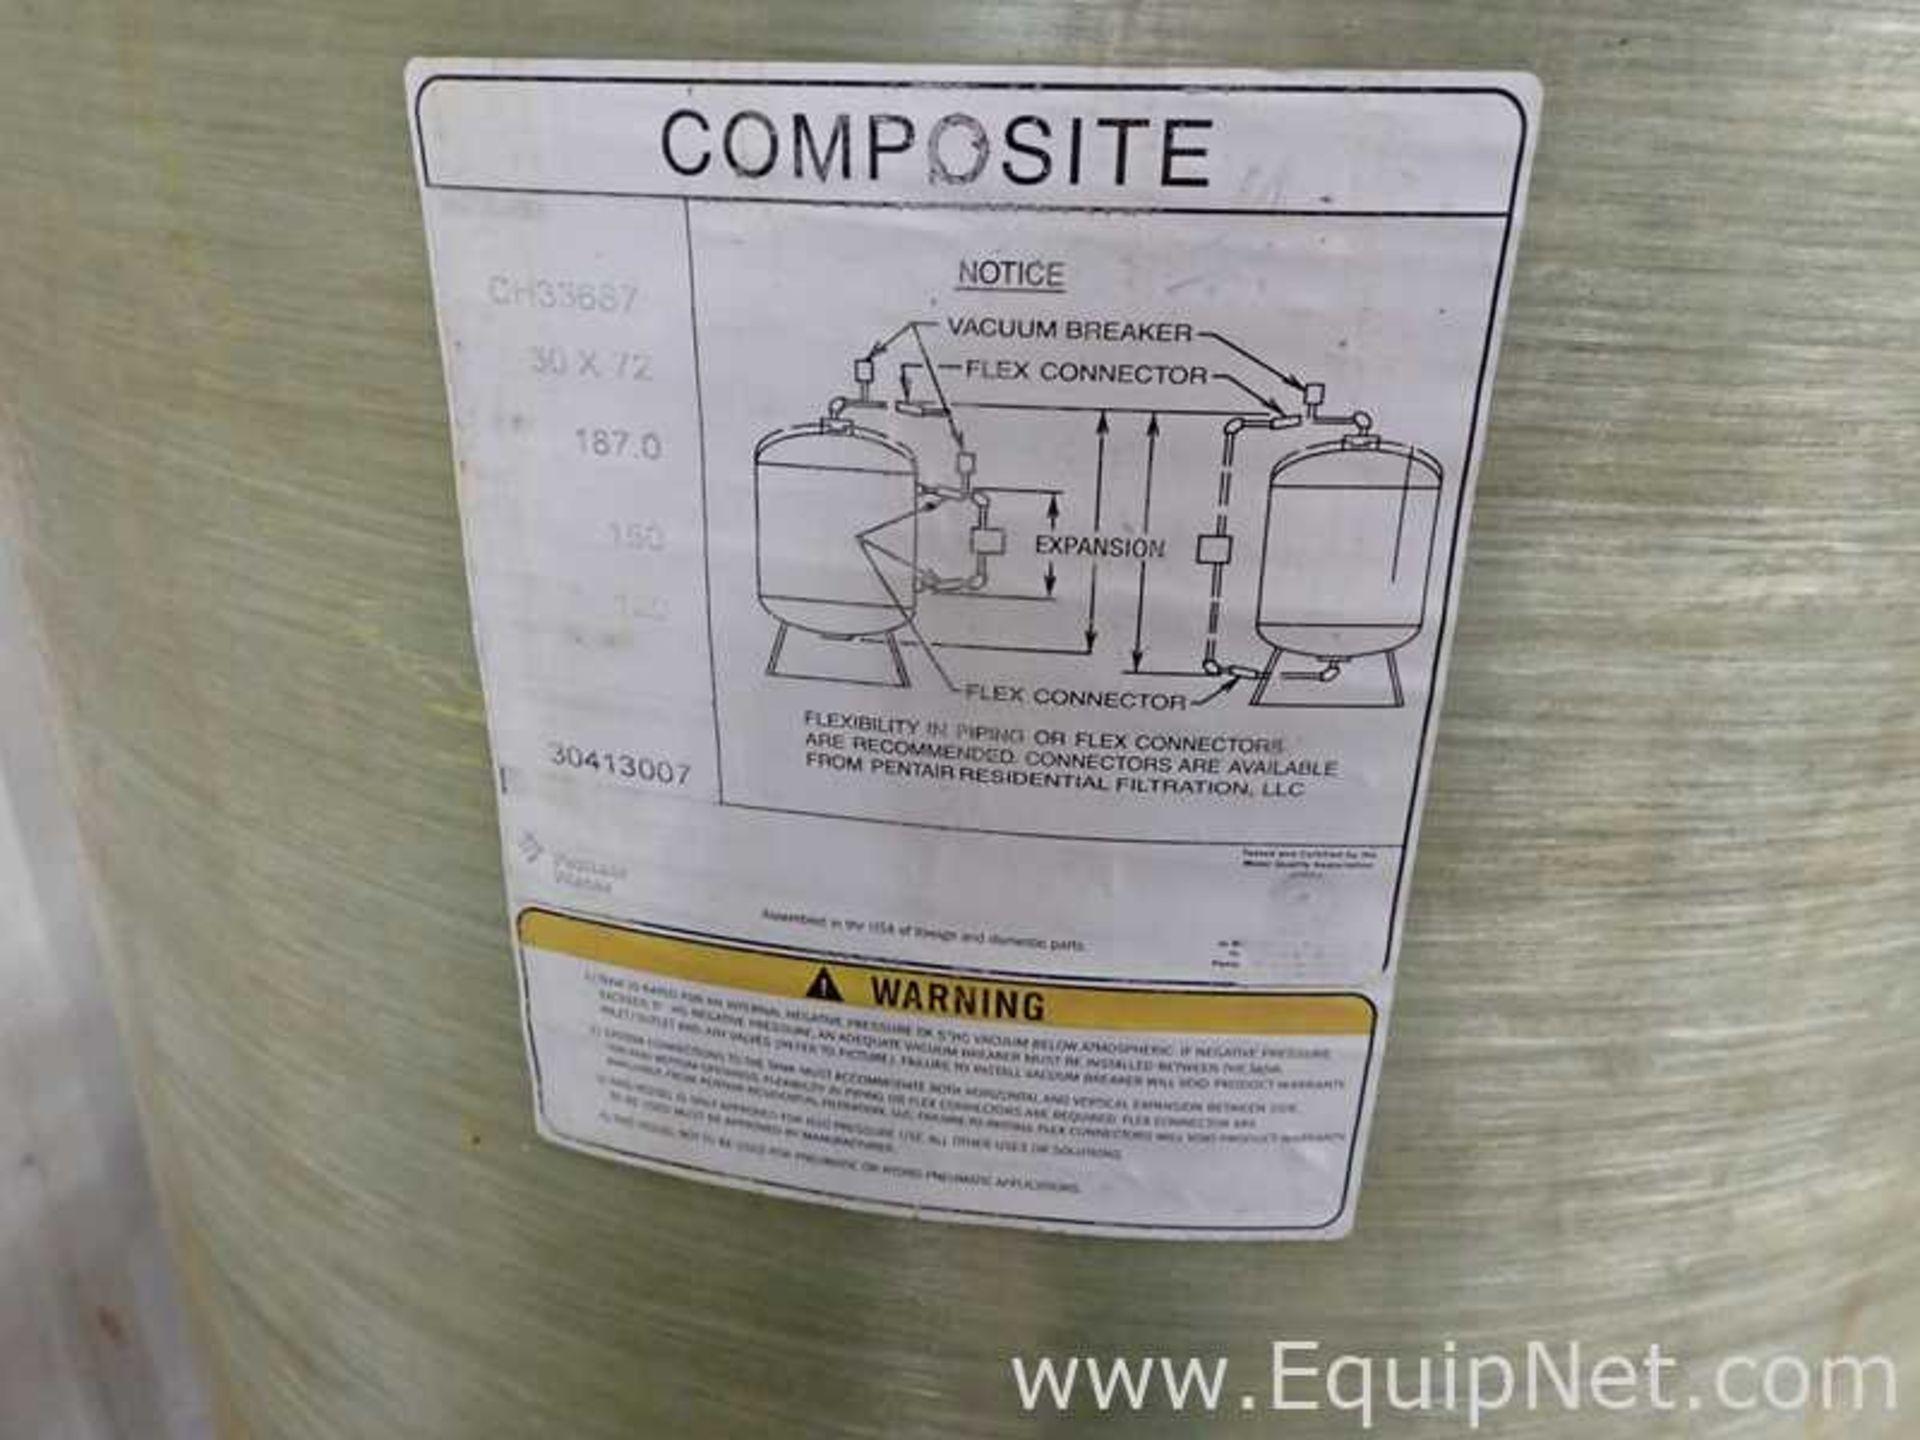 Culligan Hi-Flo 3e Water Softener System - Image 6 of 9